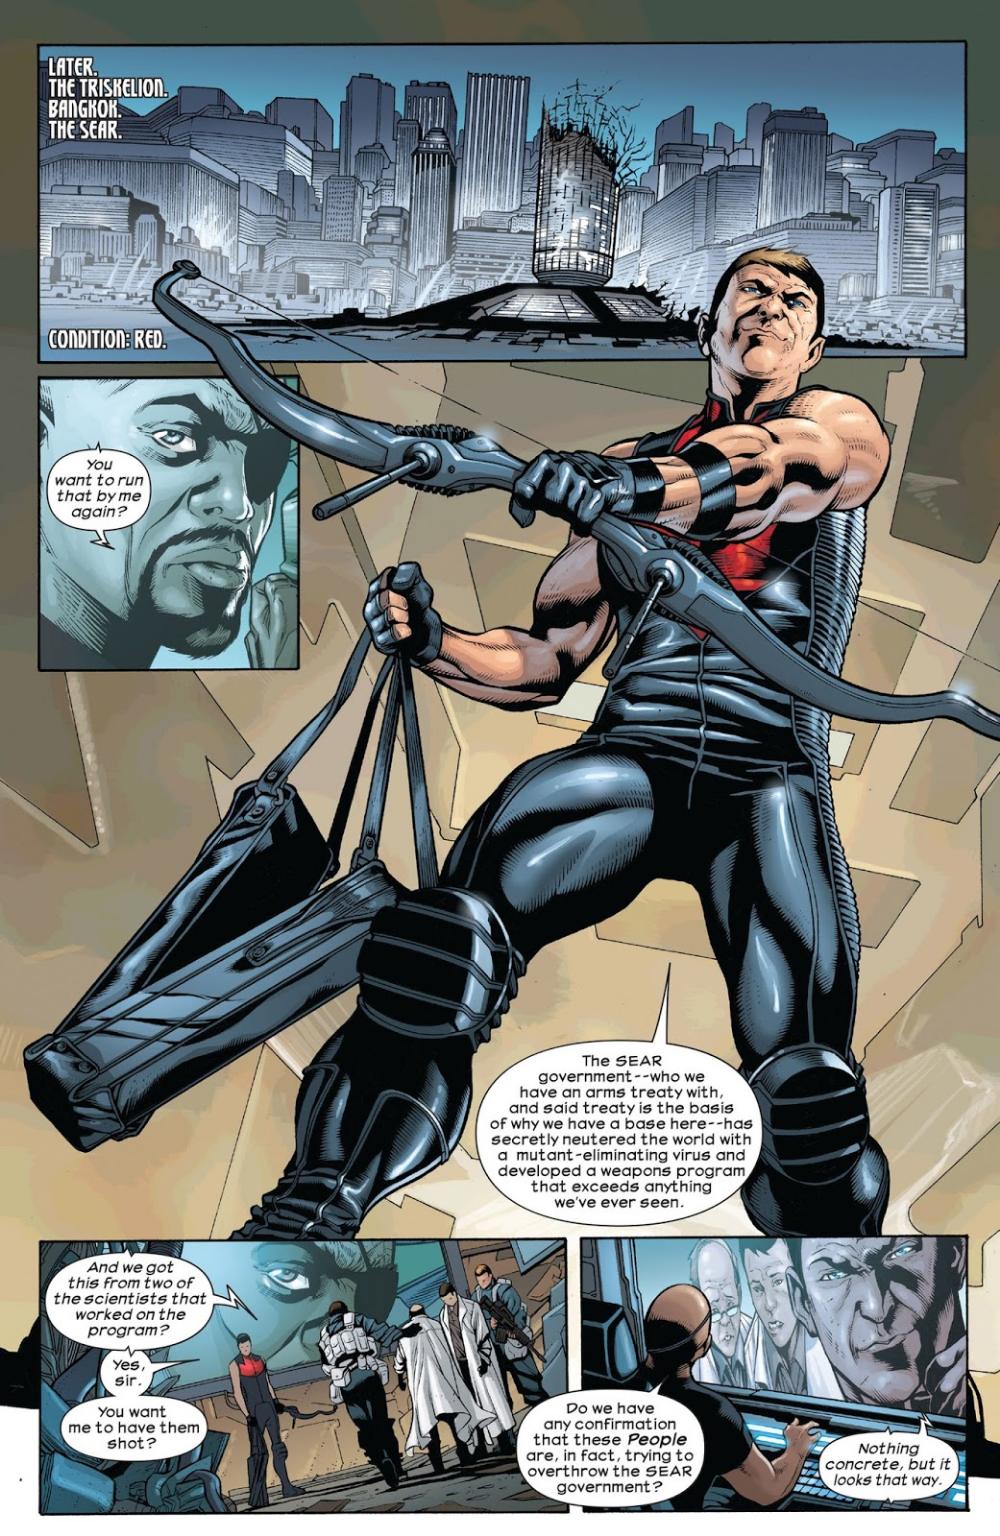 Ultimate Comics Hawkeye Issue #1 - Read Ultimate Comics Hawkeye Issue #1  comic online in high quality | Hawkeye, Avengers art, Comics online